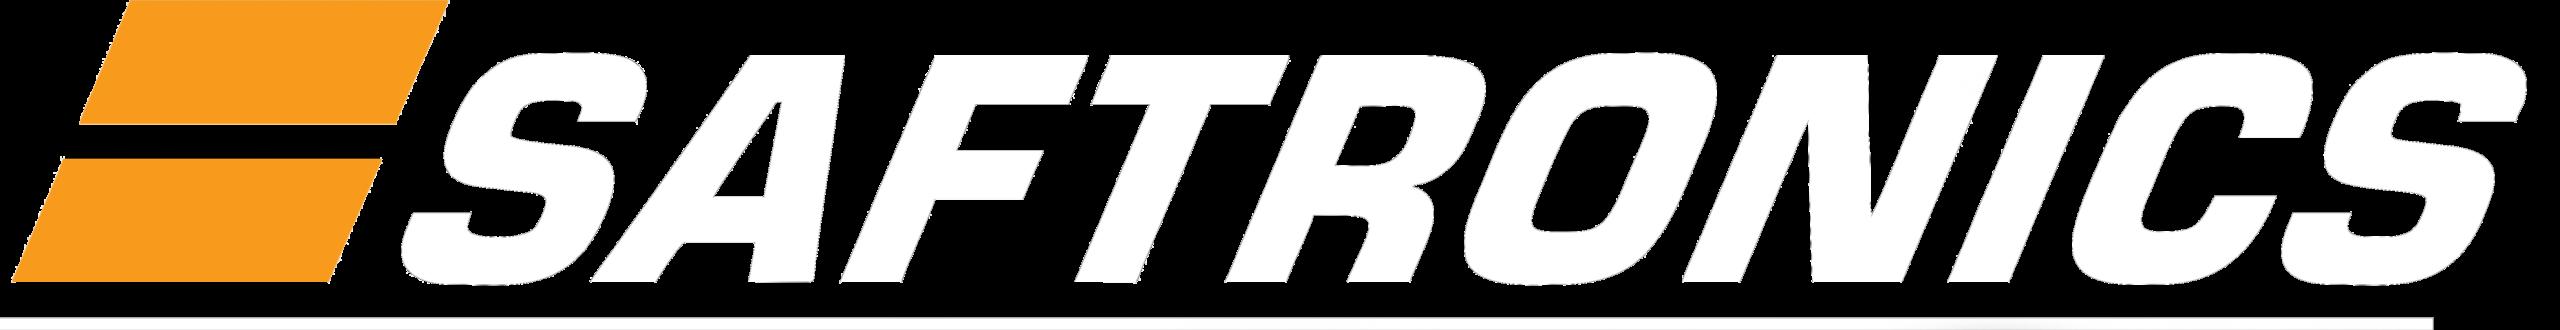 Saftronics Pty Ltd